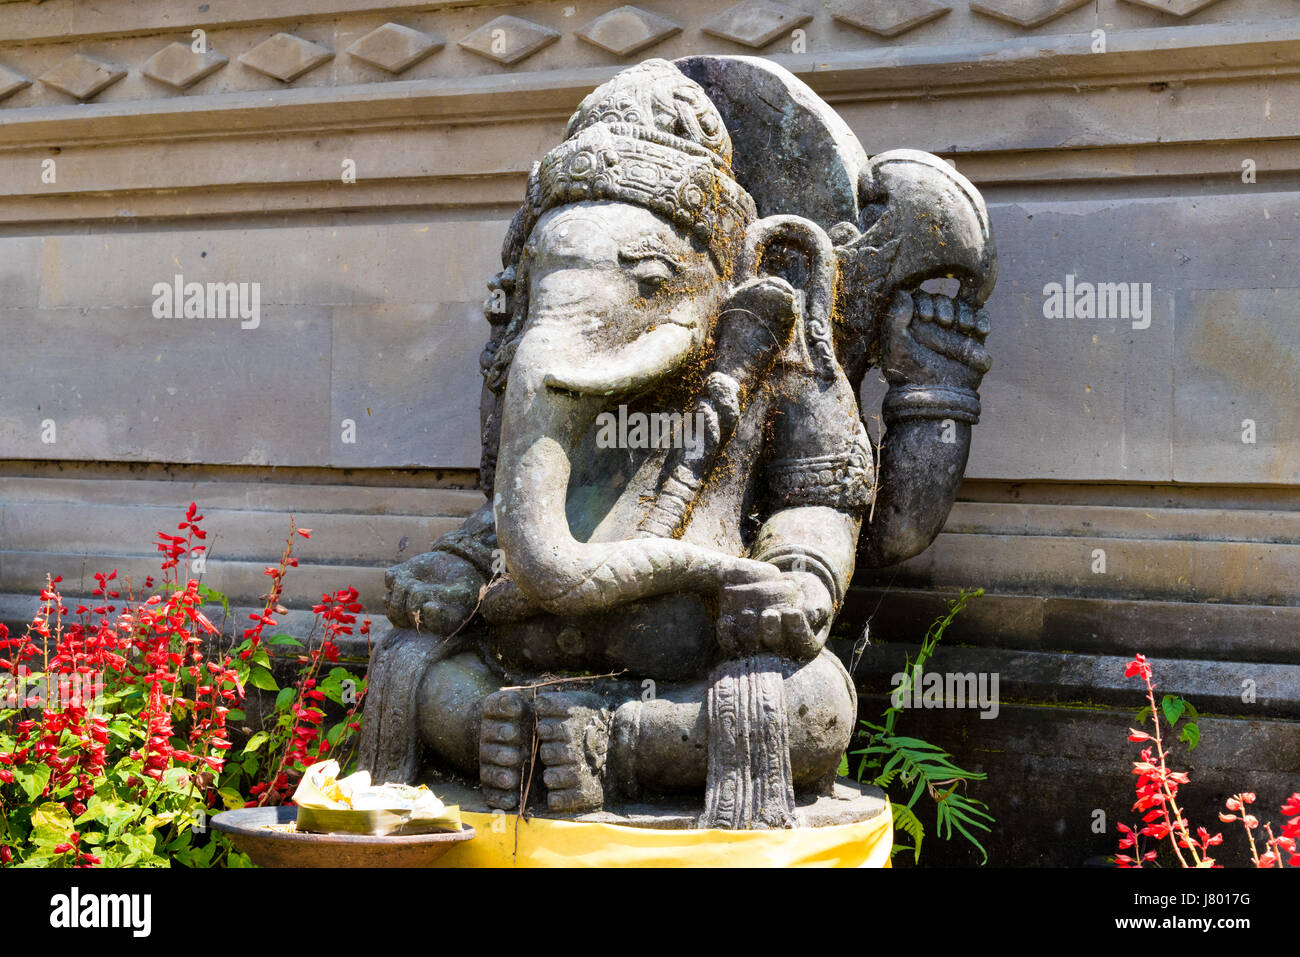 Ganesha Statue Bali Stock Photos & Ganesha Statue Bali